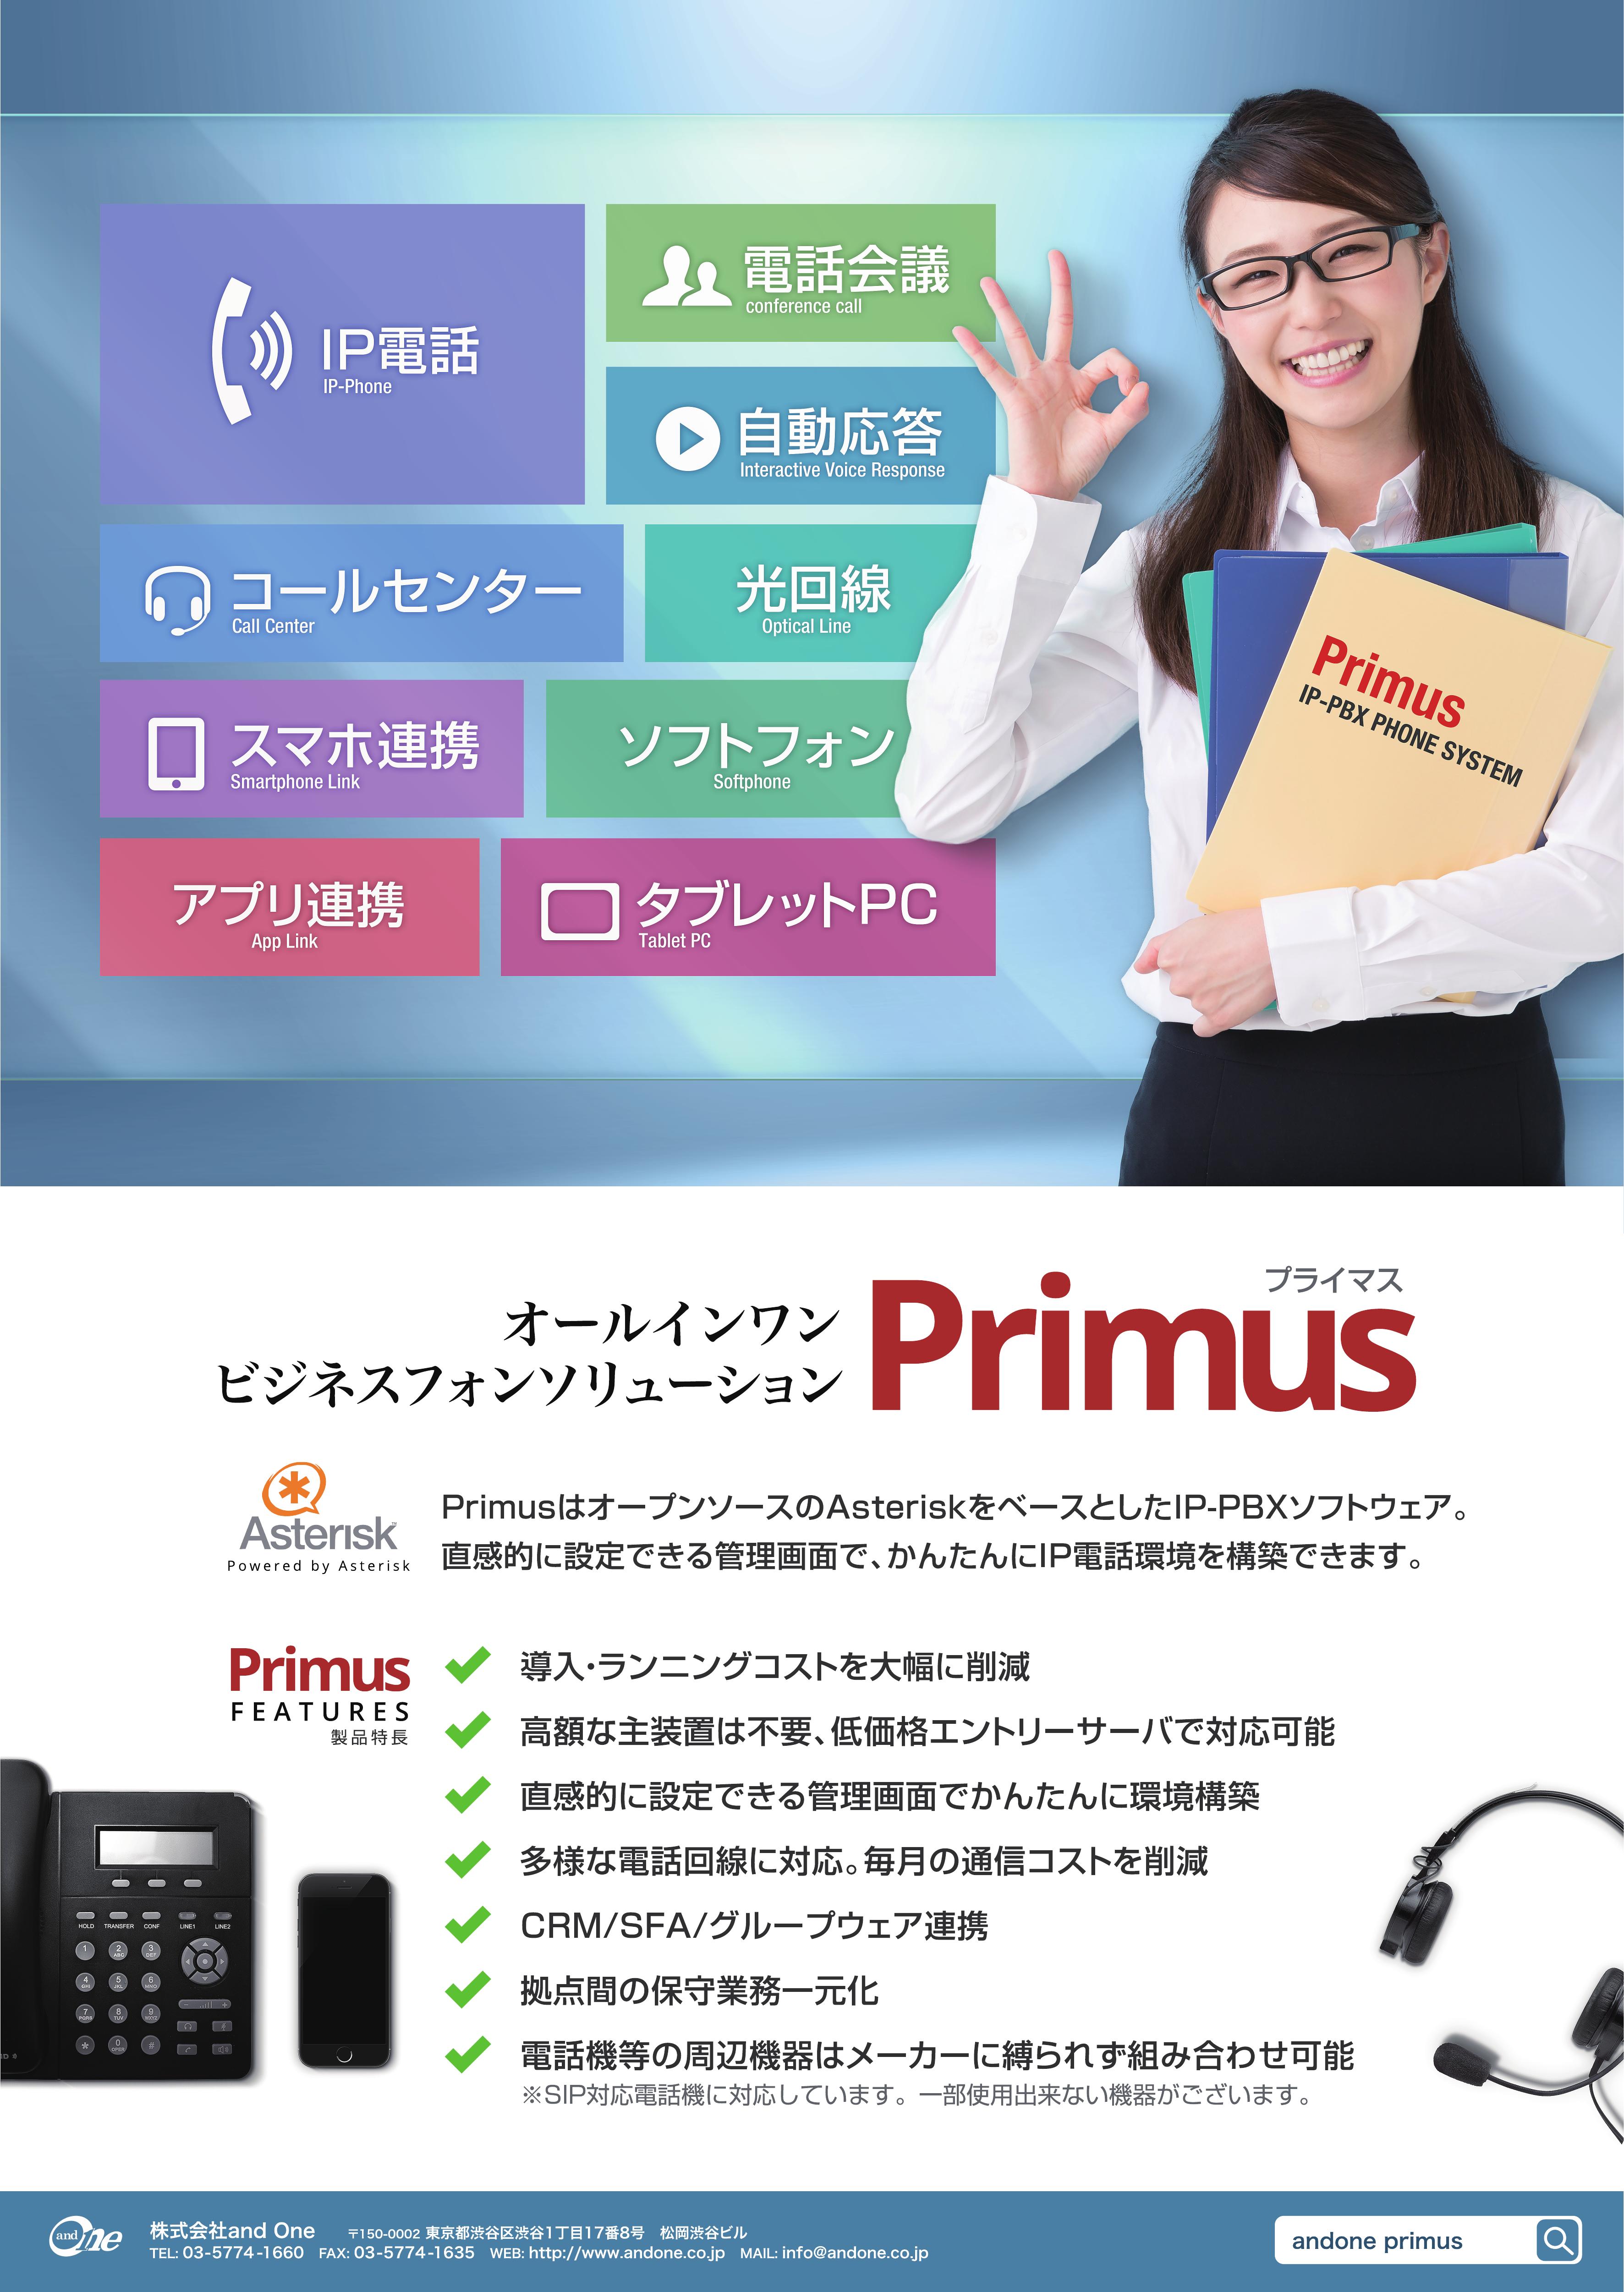 IP-PBXソフトウェア オールインワンビジネスフォンソリューション Primus(プライマス)